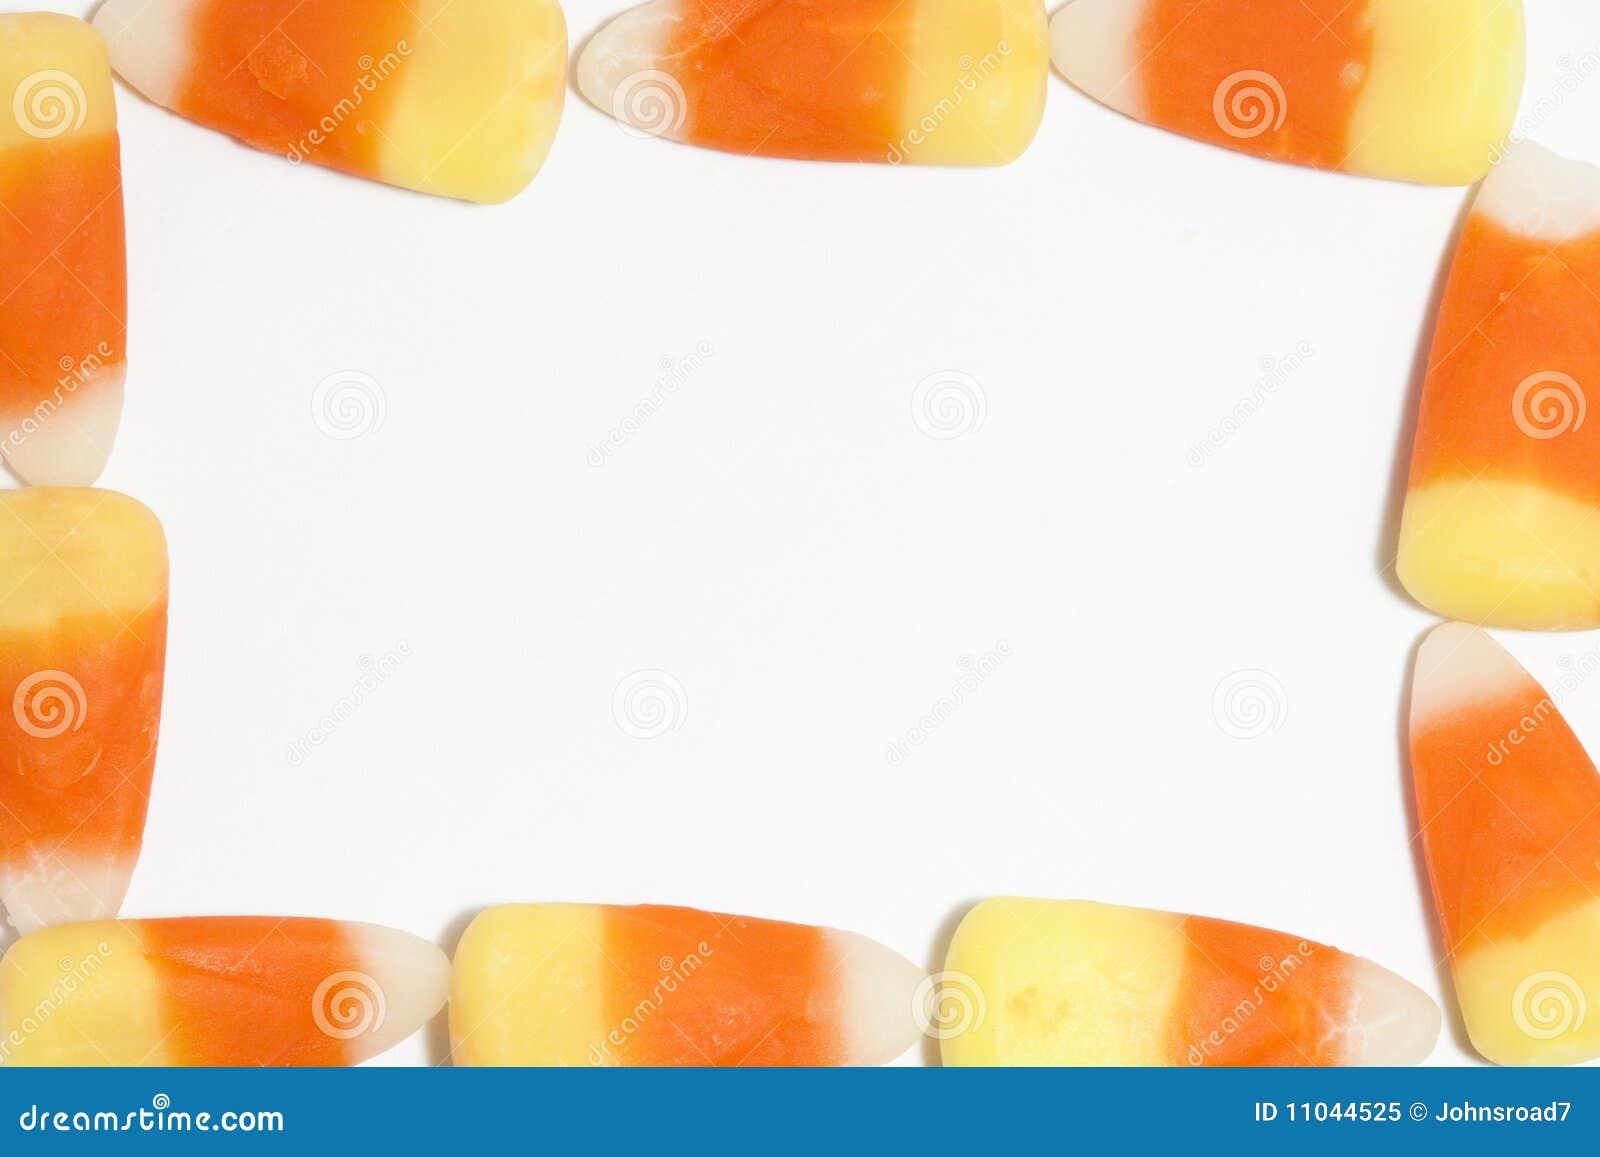 Marco del maíz de caramelo imagen de archivo. Imagen de maíz - 11044525